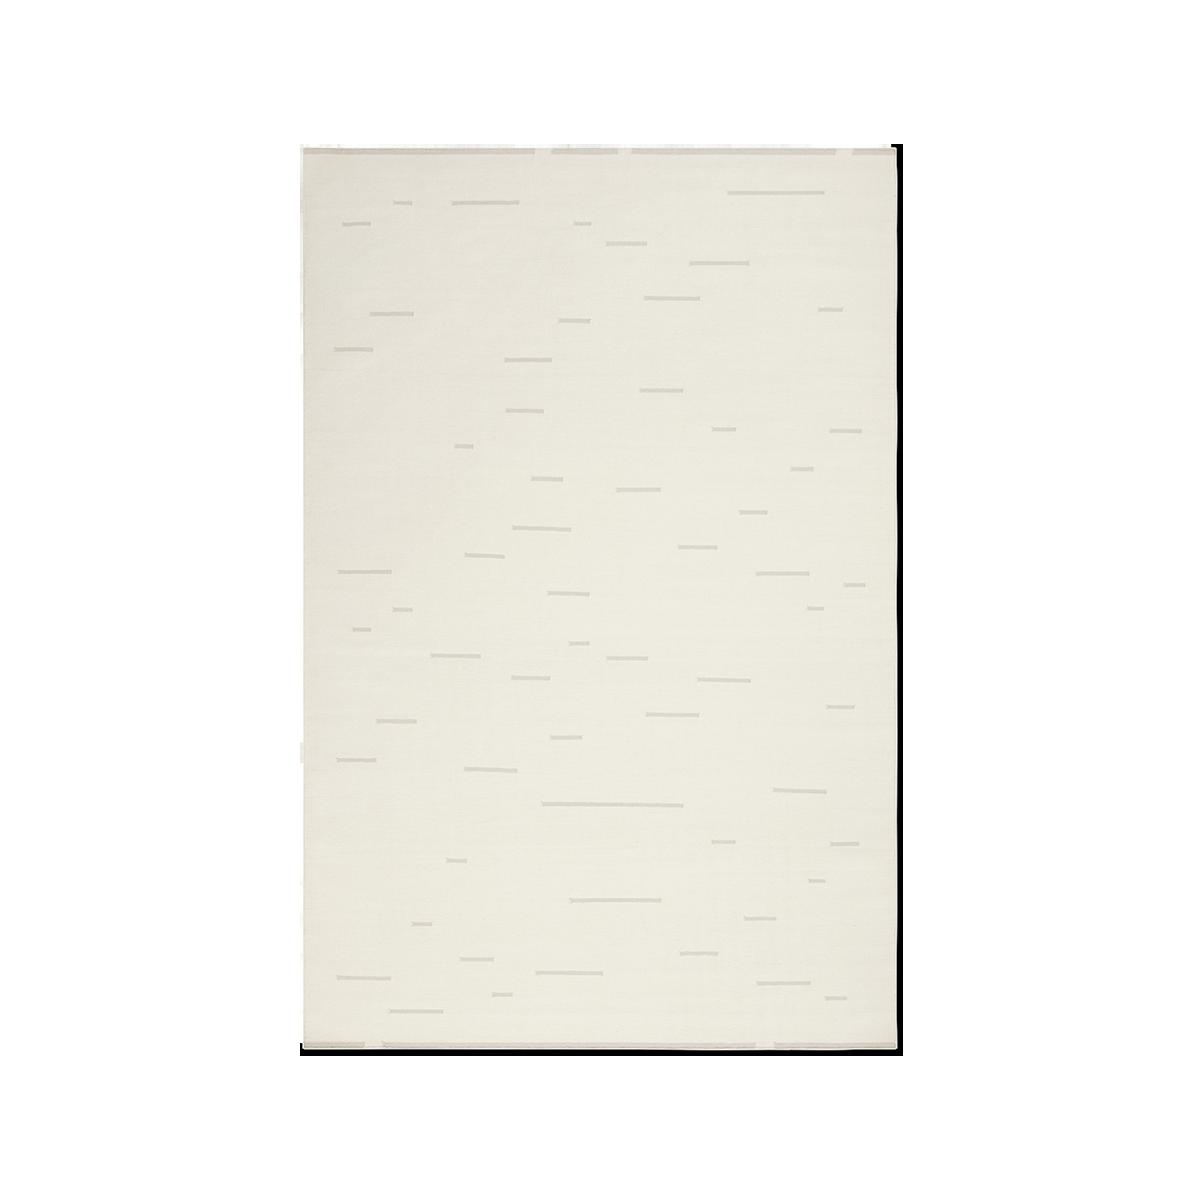 Product image of Rain Dusty White flat-weave rug.